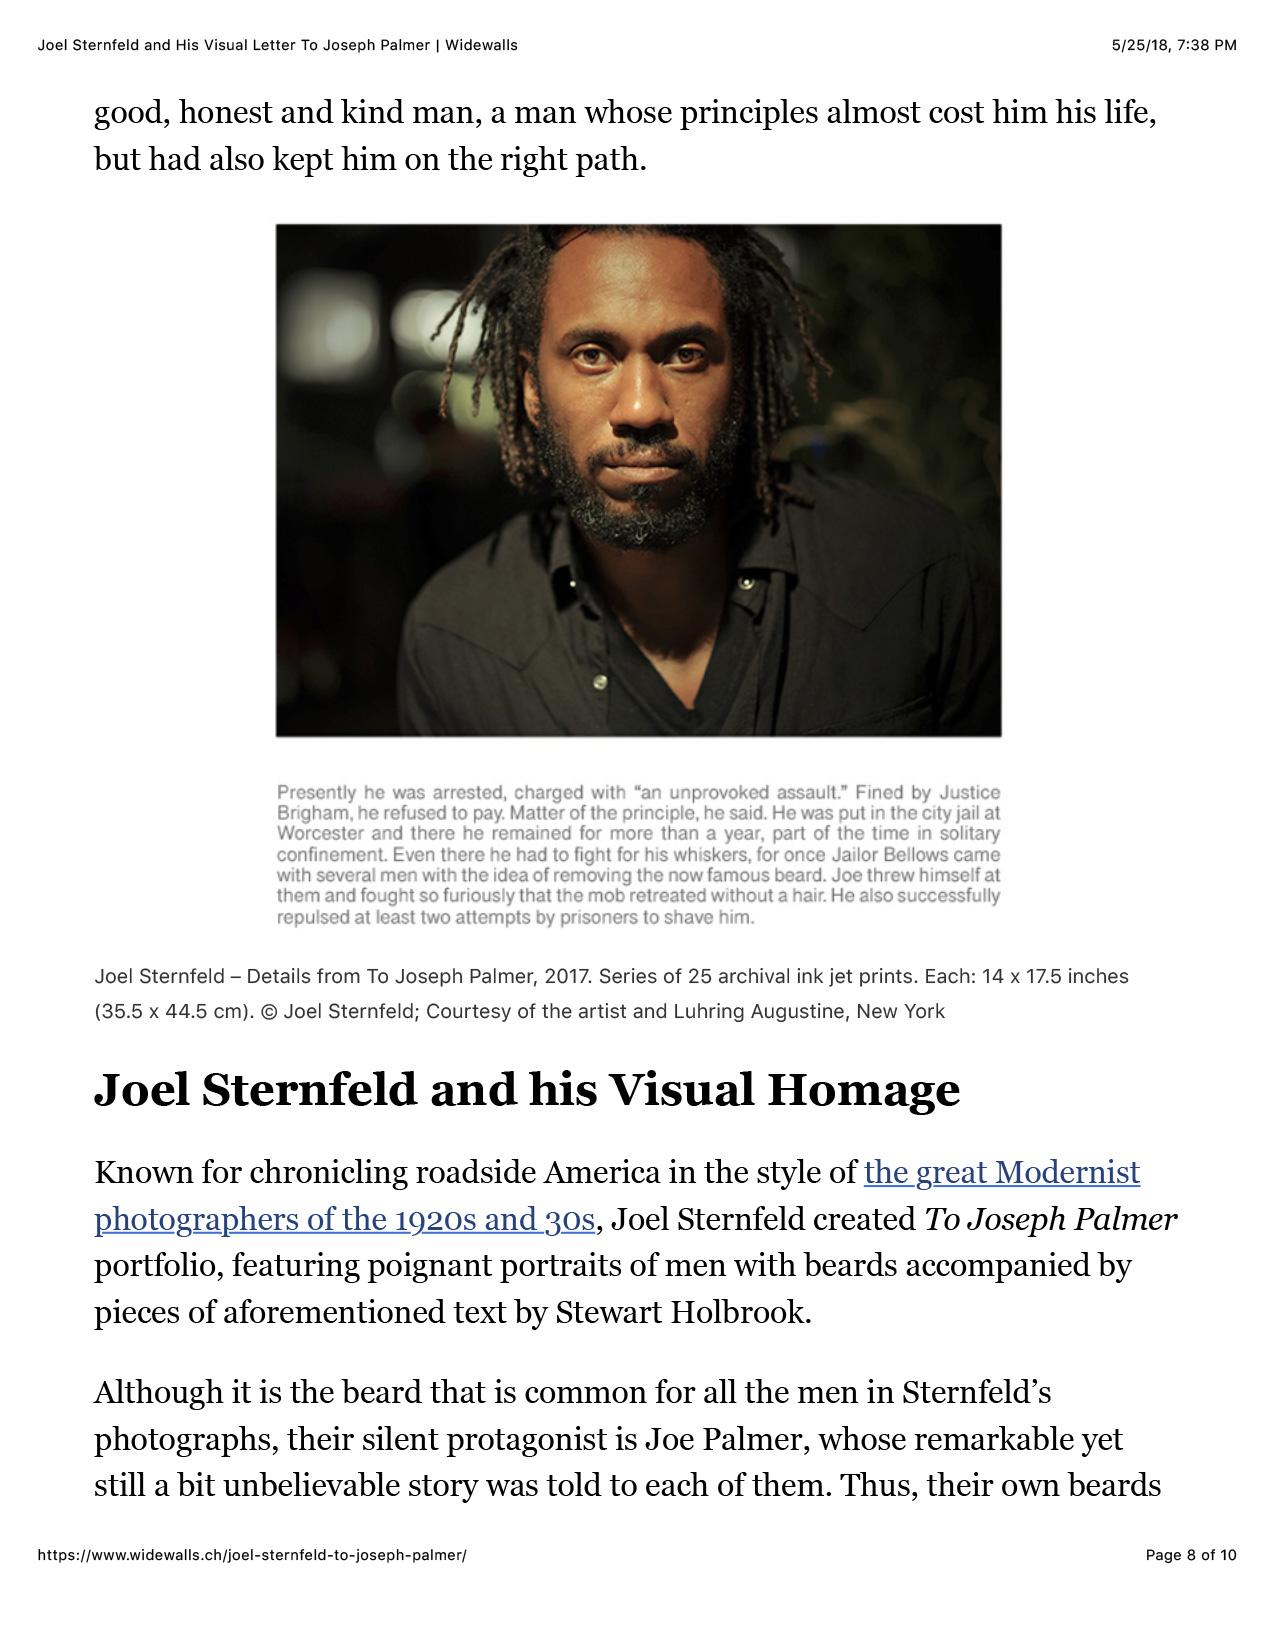 Joel-Sternfeld-and-His-Visual-Letter-To-Joseph-Palmer-_-Widewalls-8.jpg